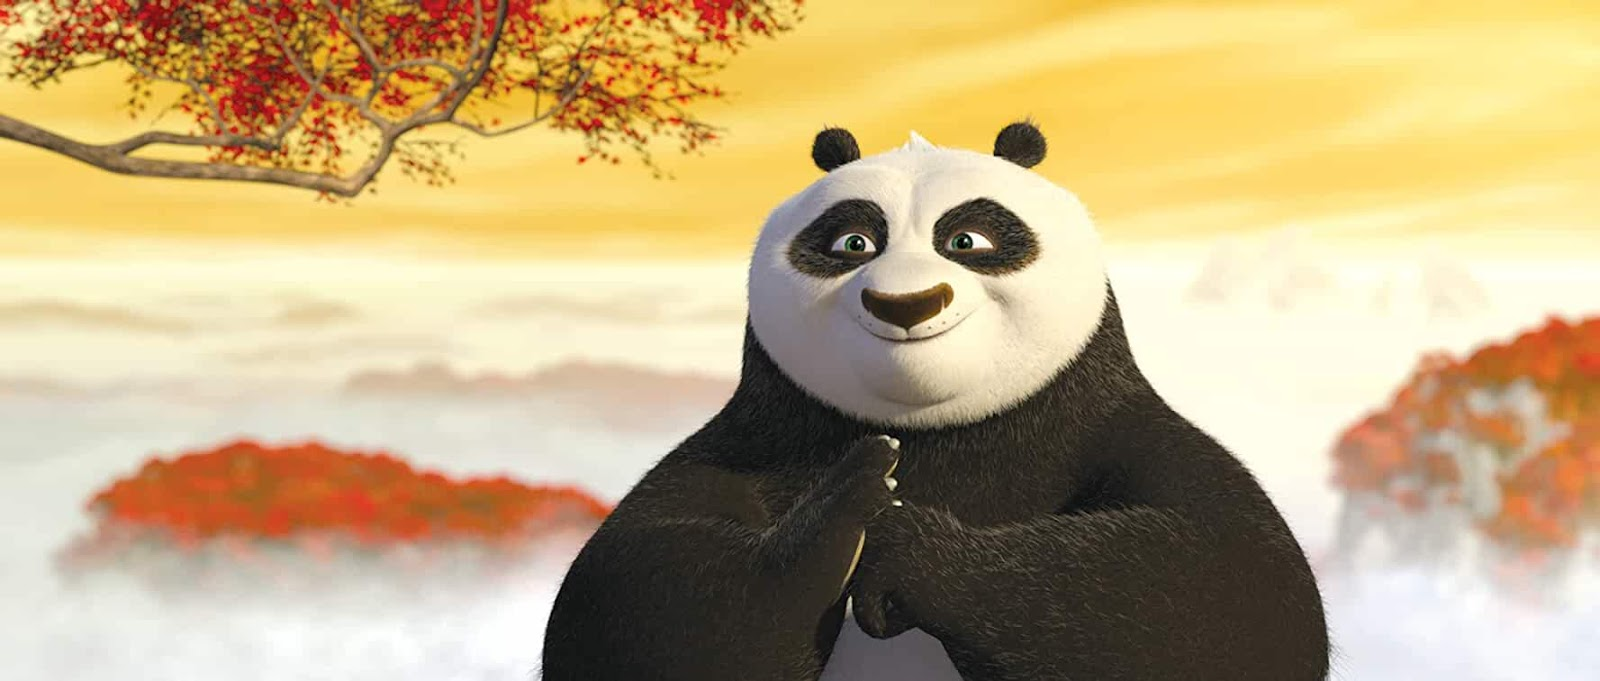 Kung Fu Panda (2008) Full Movie Hindi Dubbed Filmyzilla.